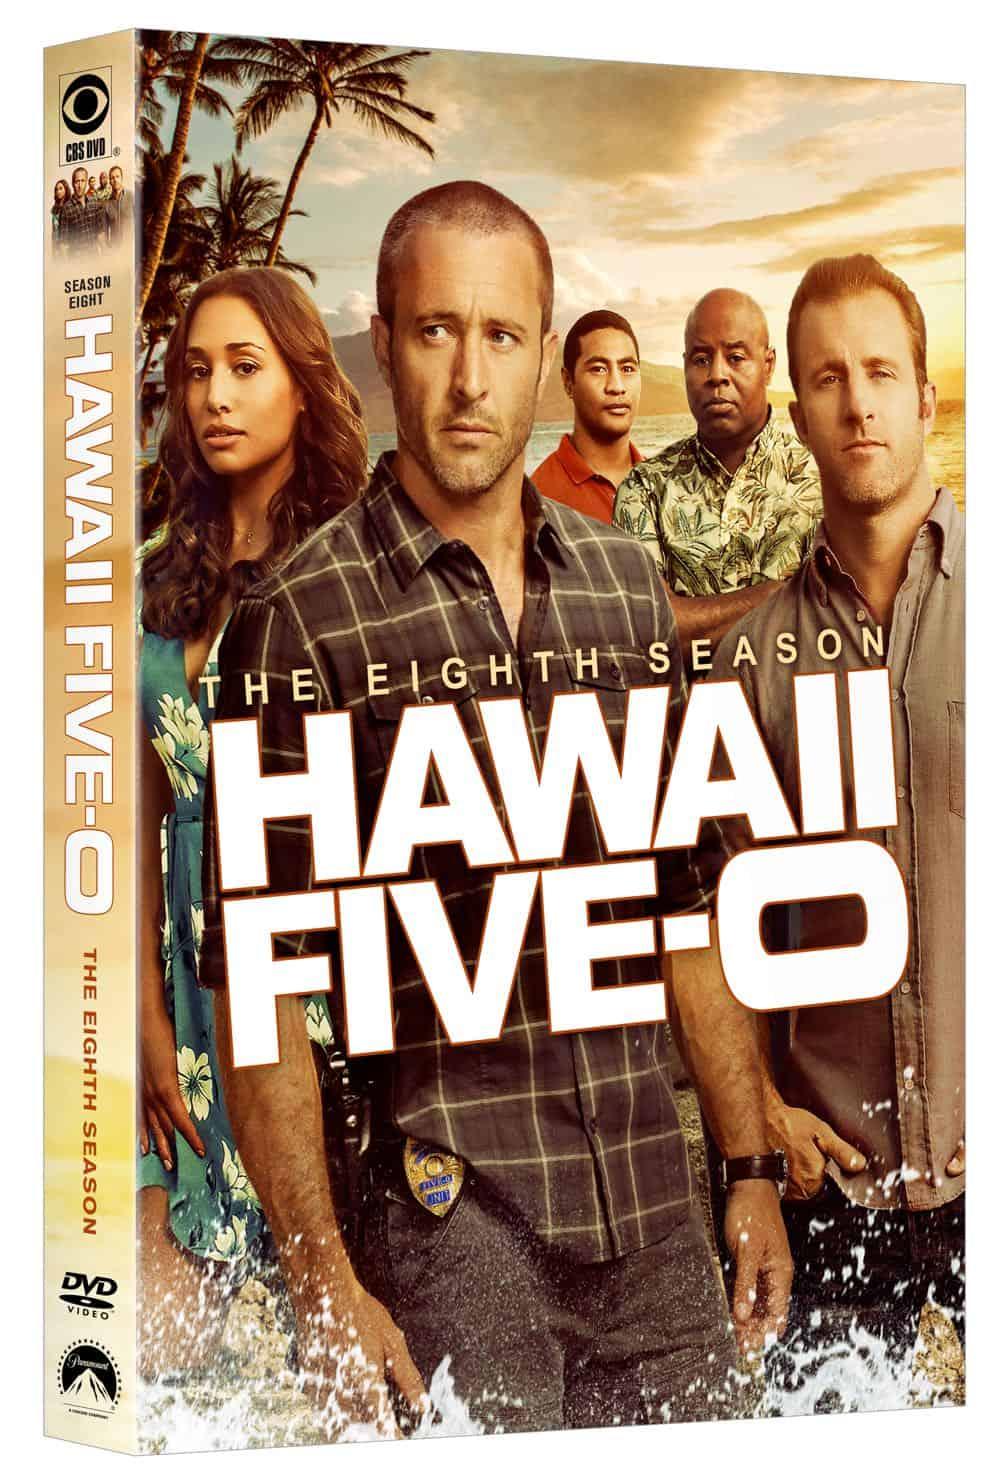 Hawaii Five 0 Season 8 DVD Cover 1